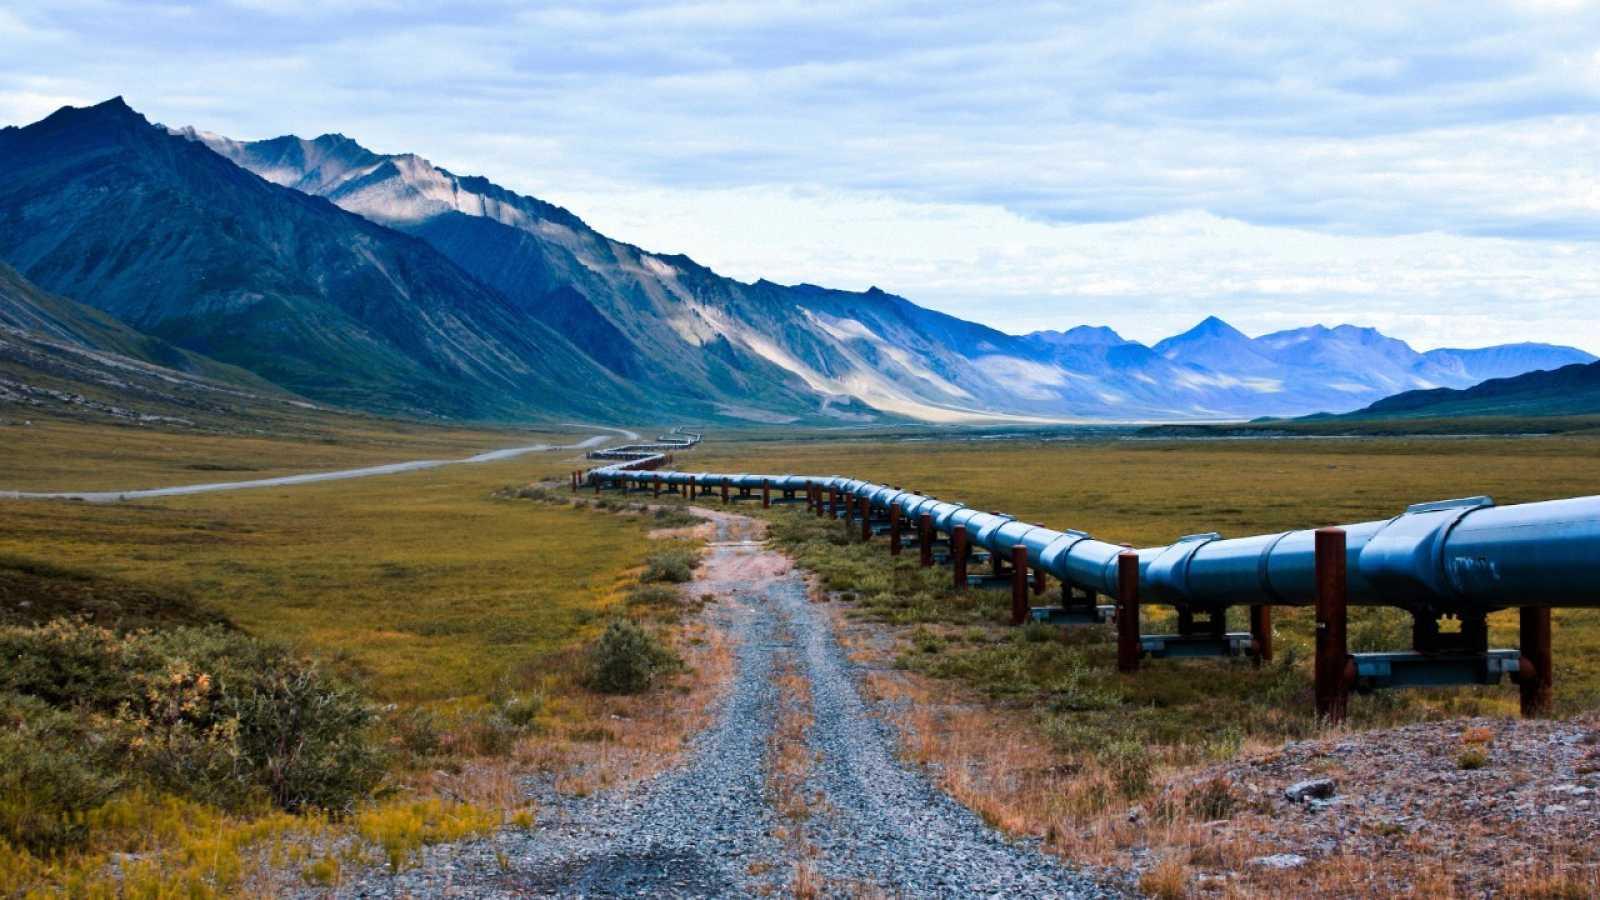 Un oleoducto lleva el petróleo del norte de Alaska hasta Valdez cerca de la reserva natural del Ártico